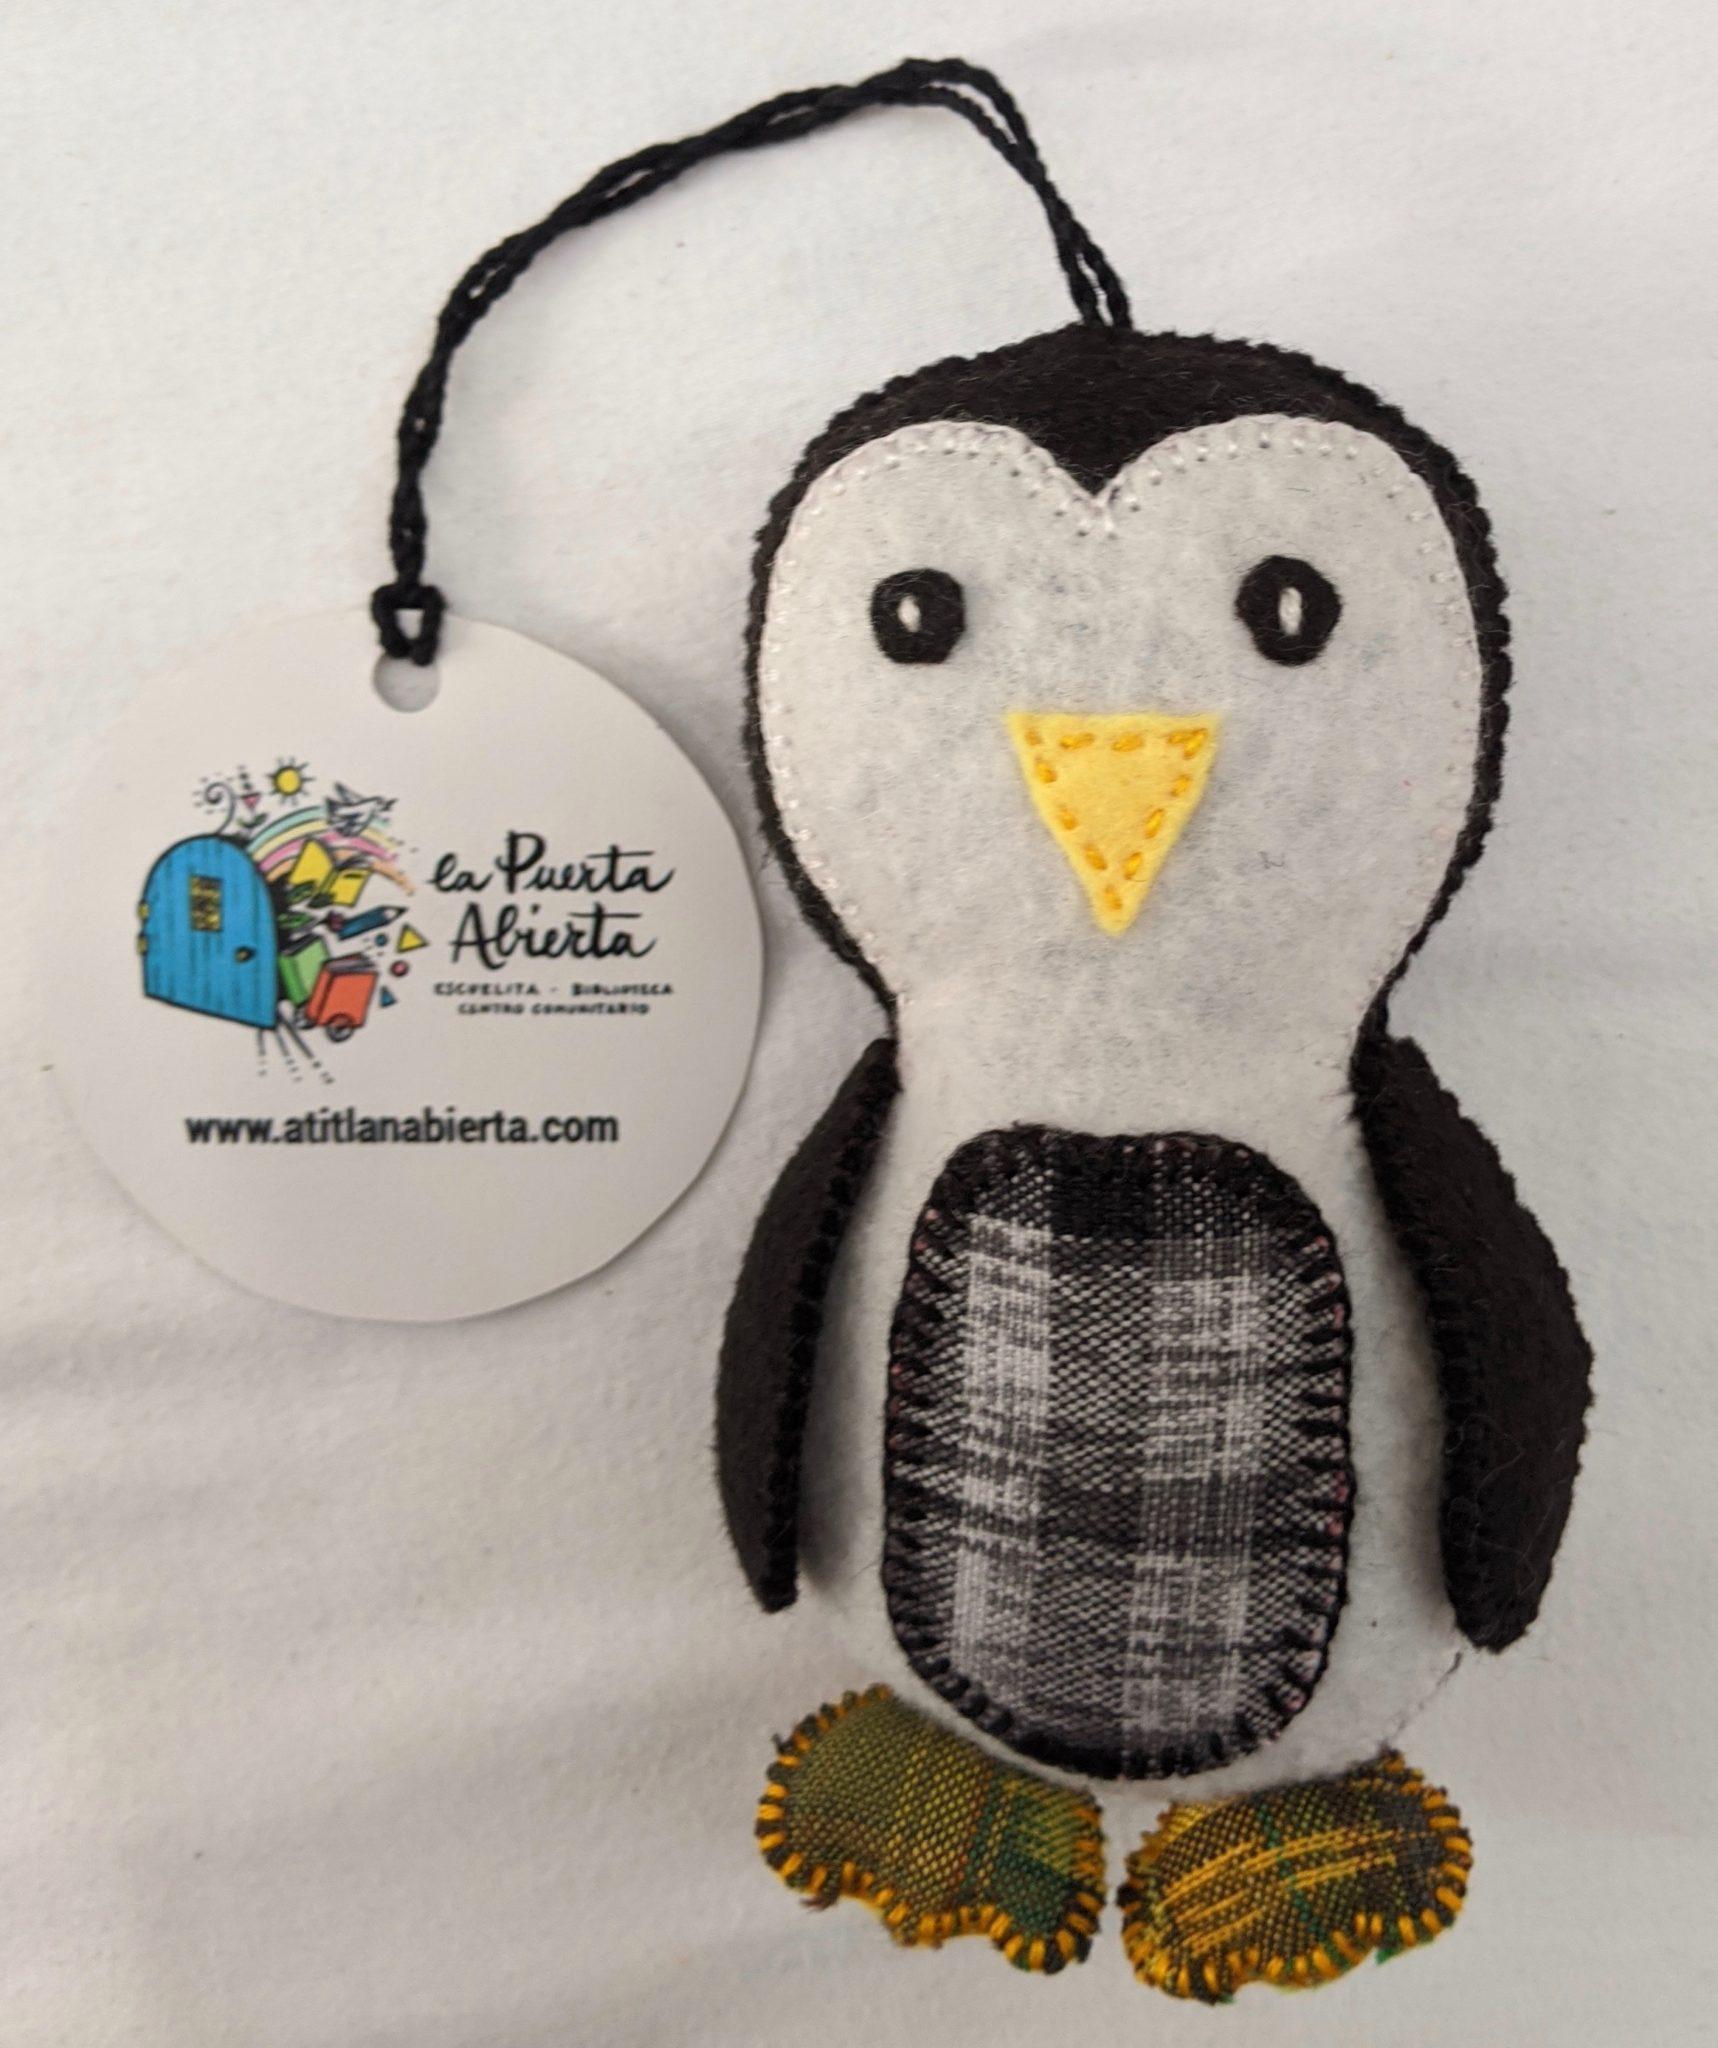 Penguin Ornament - Felt and Repurposed Traditional Fabric